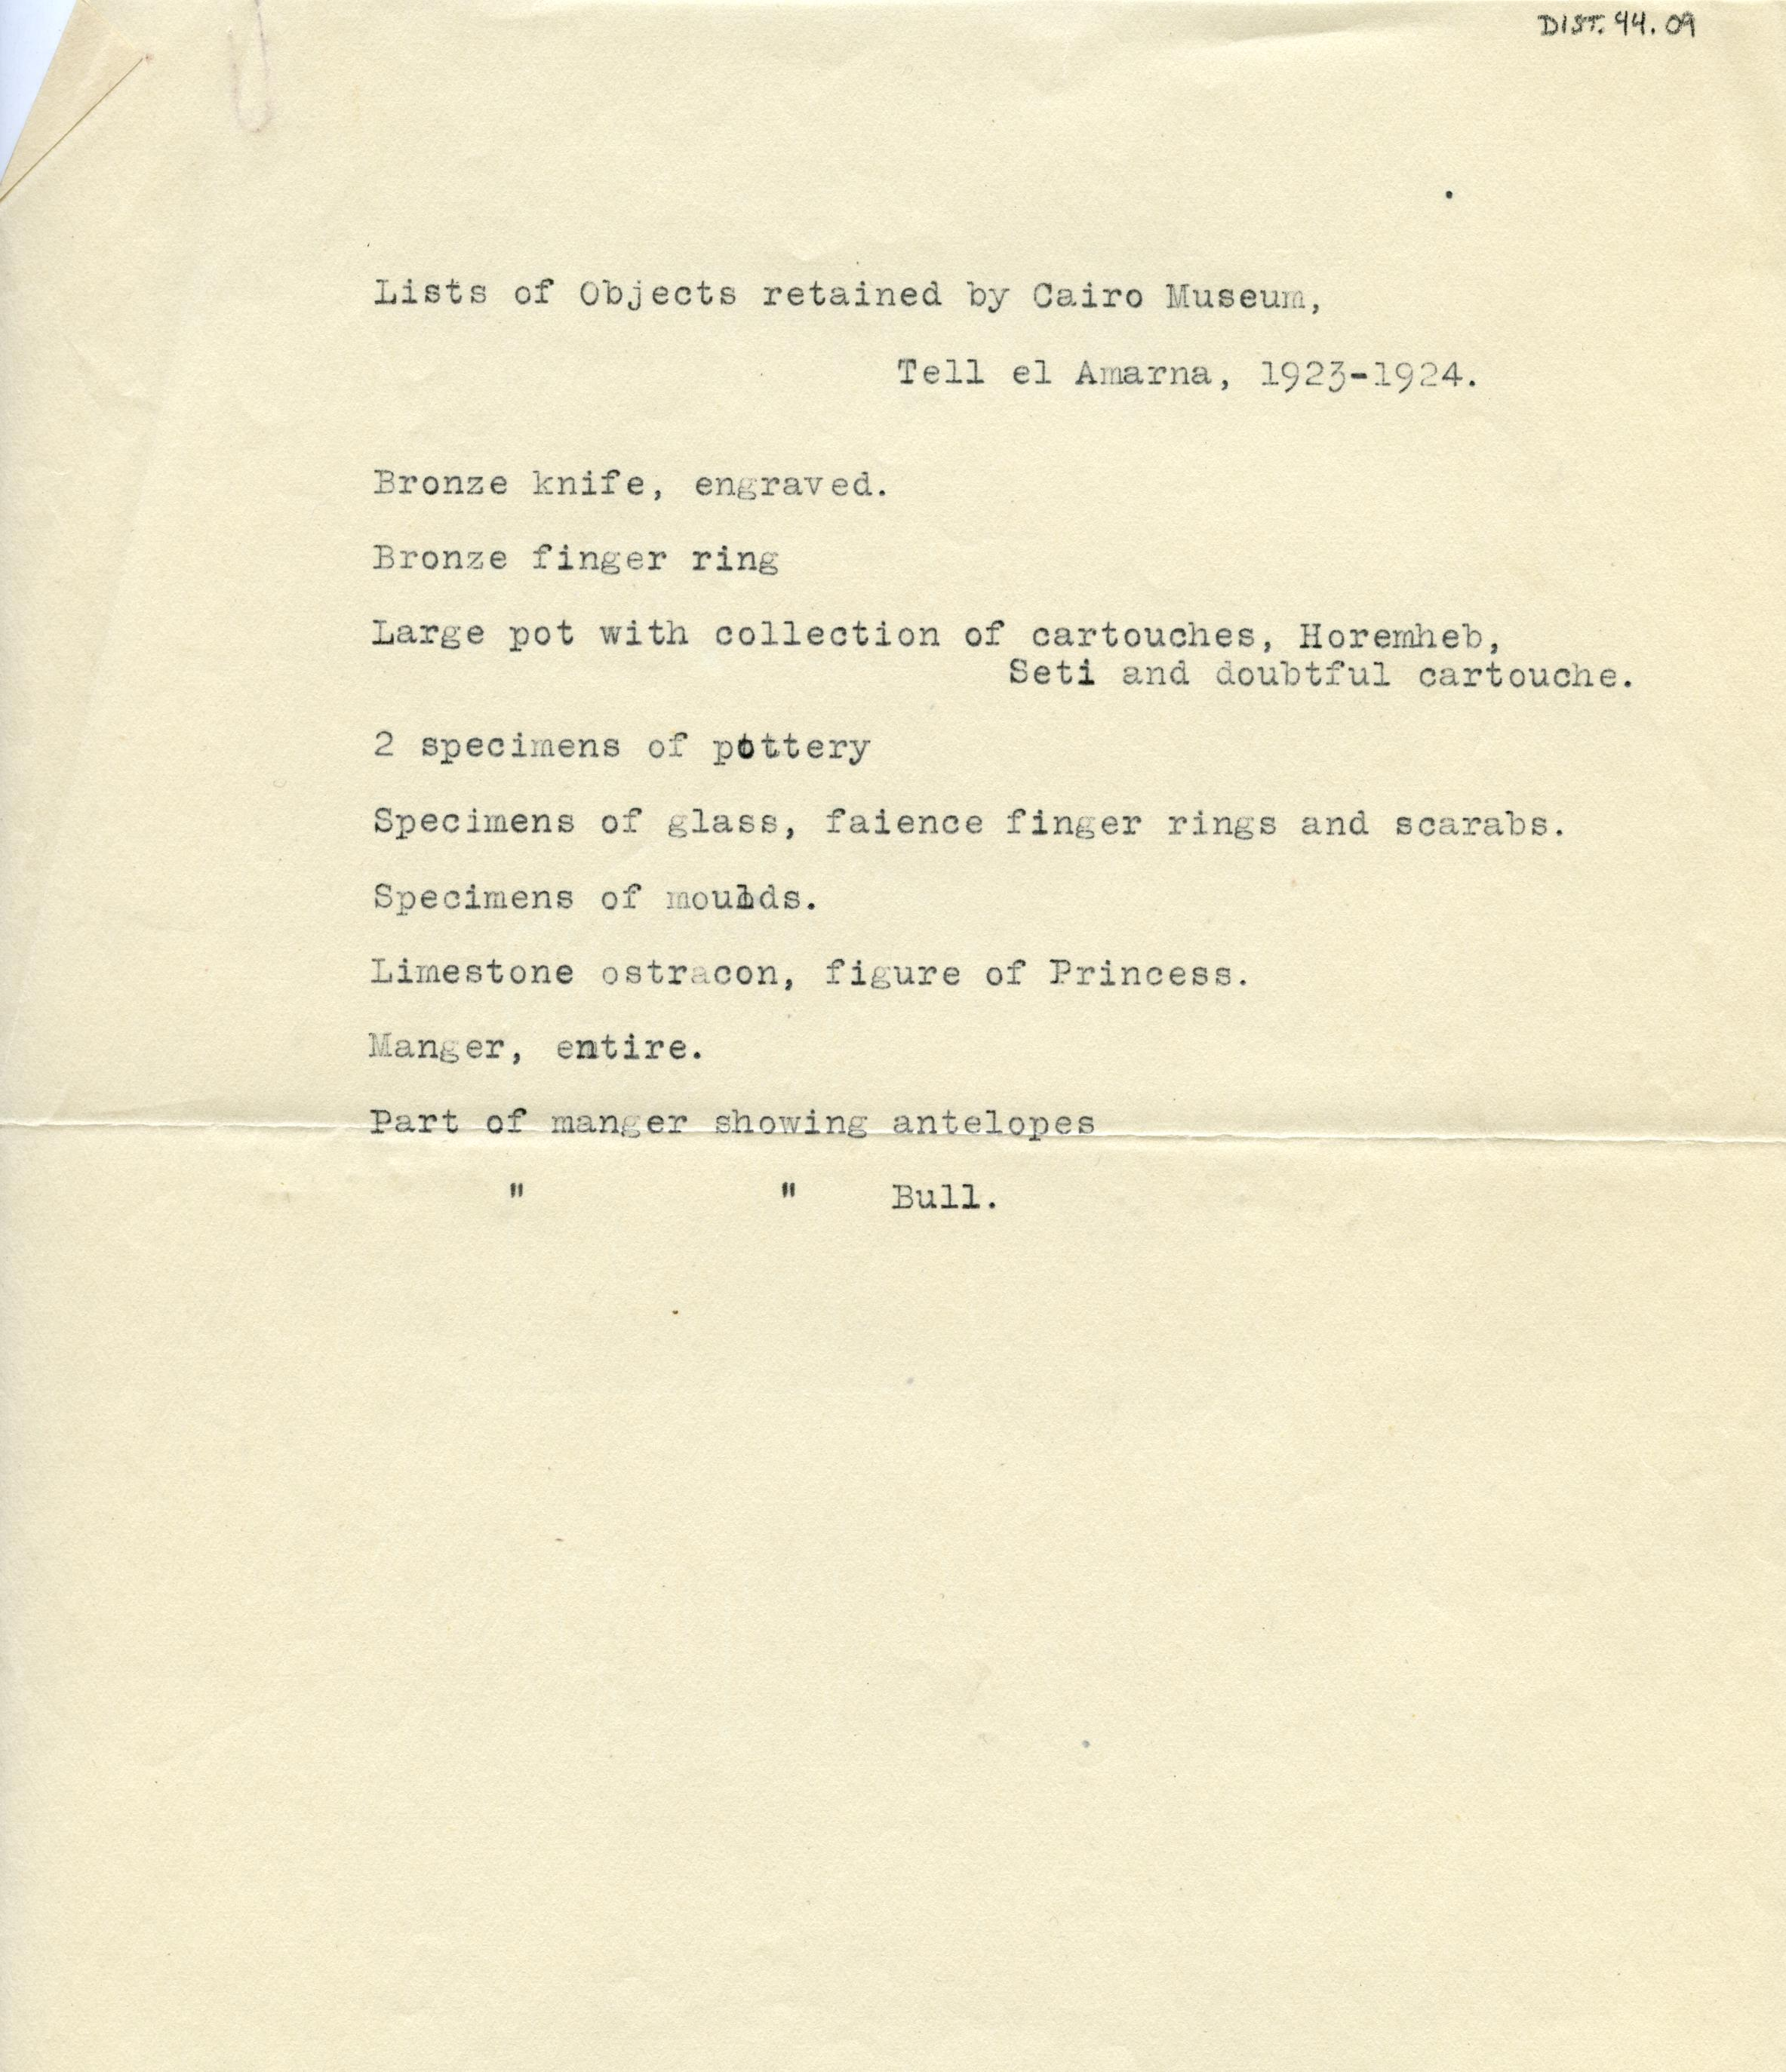 1923-25 el-Amarna DIST.44.09